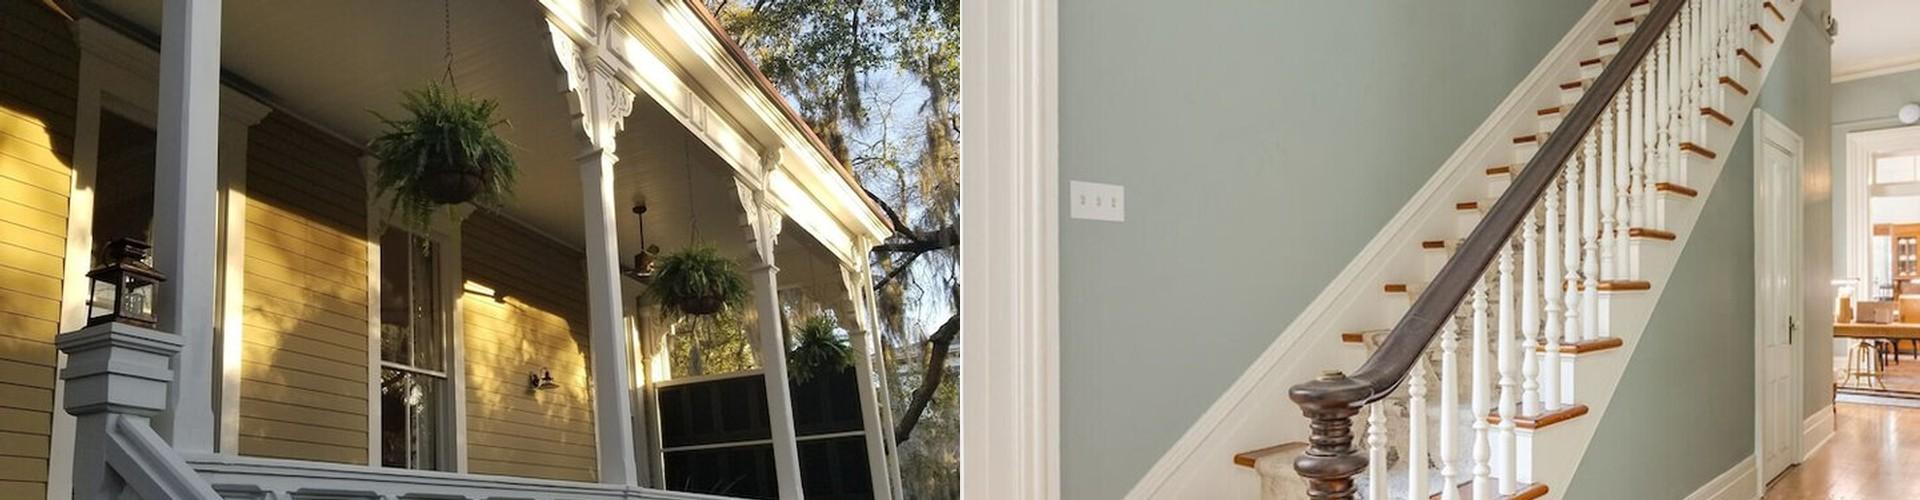 Best Savannah Family Reunion Hotels - Savannah (GA) Family Reunion ...